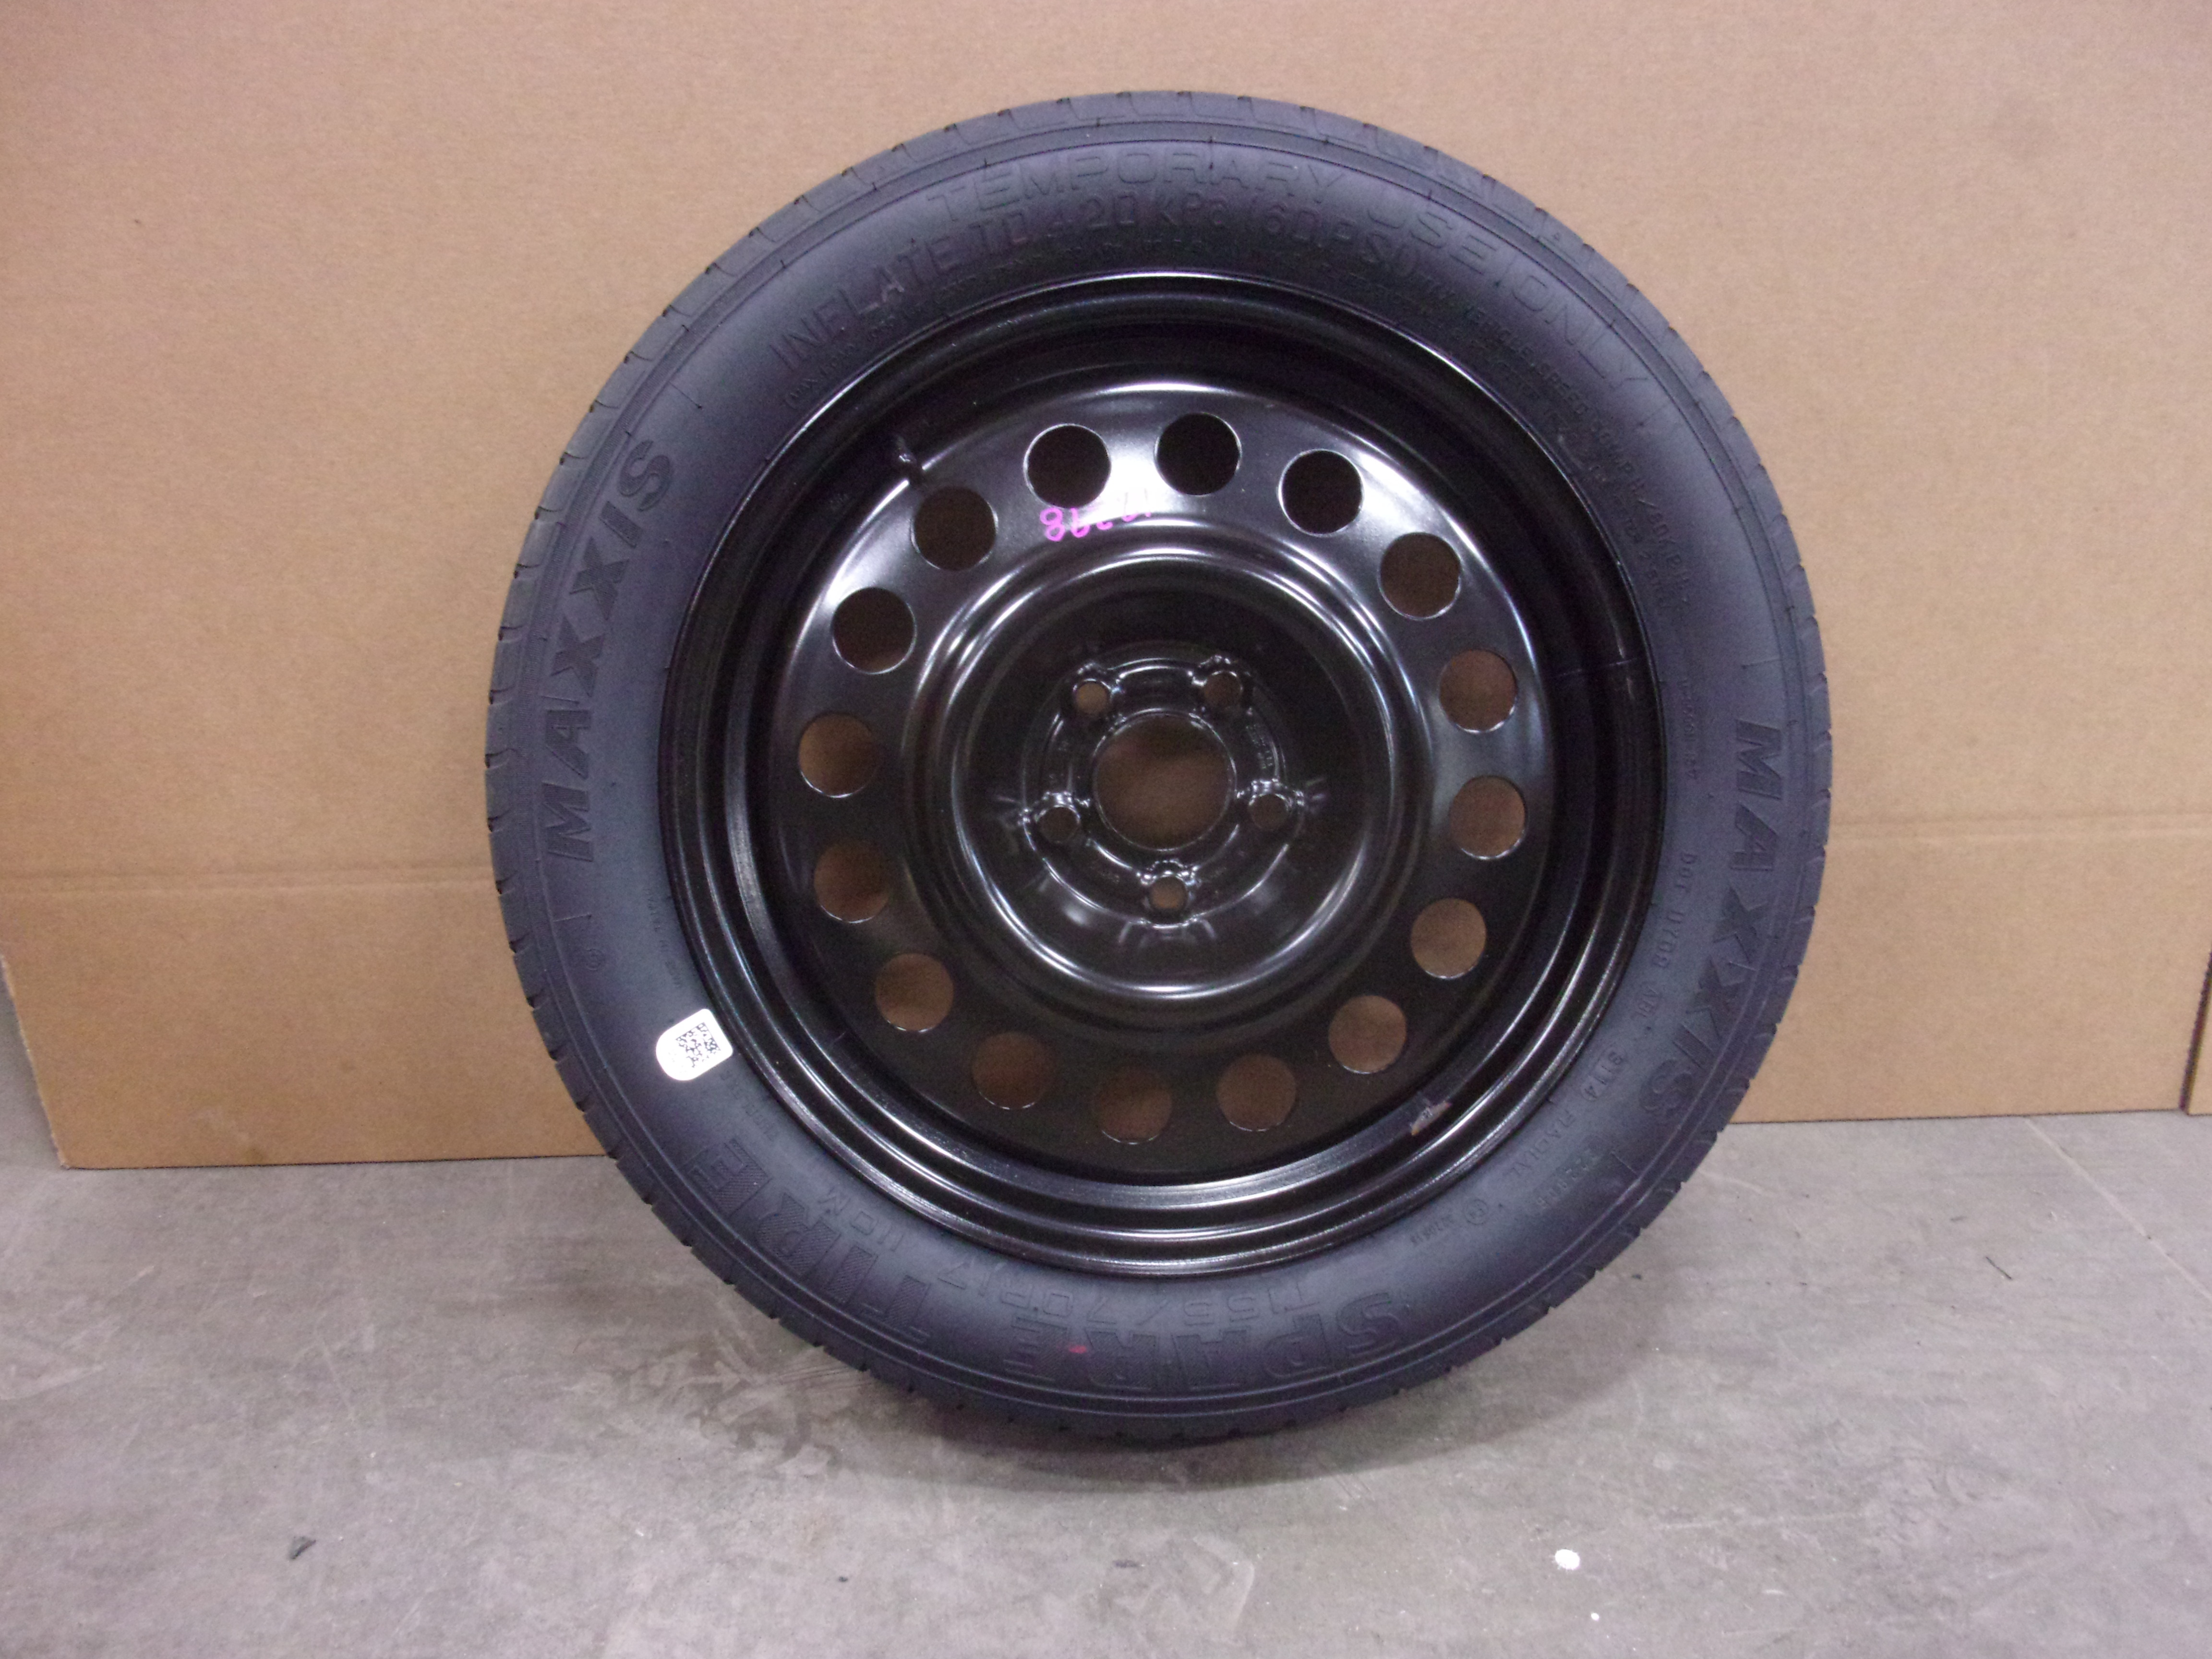 2010-2017-Chevrolet-Equinox-17x4-5-Steel-Wheel-T155-70R17-Compact-Spare-Tire-OEM